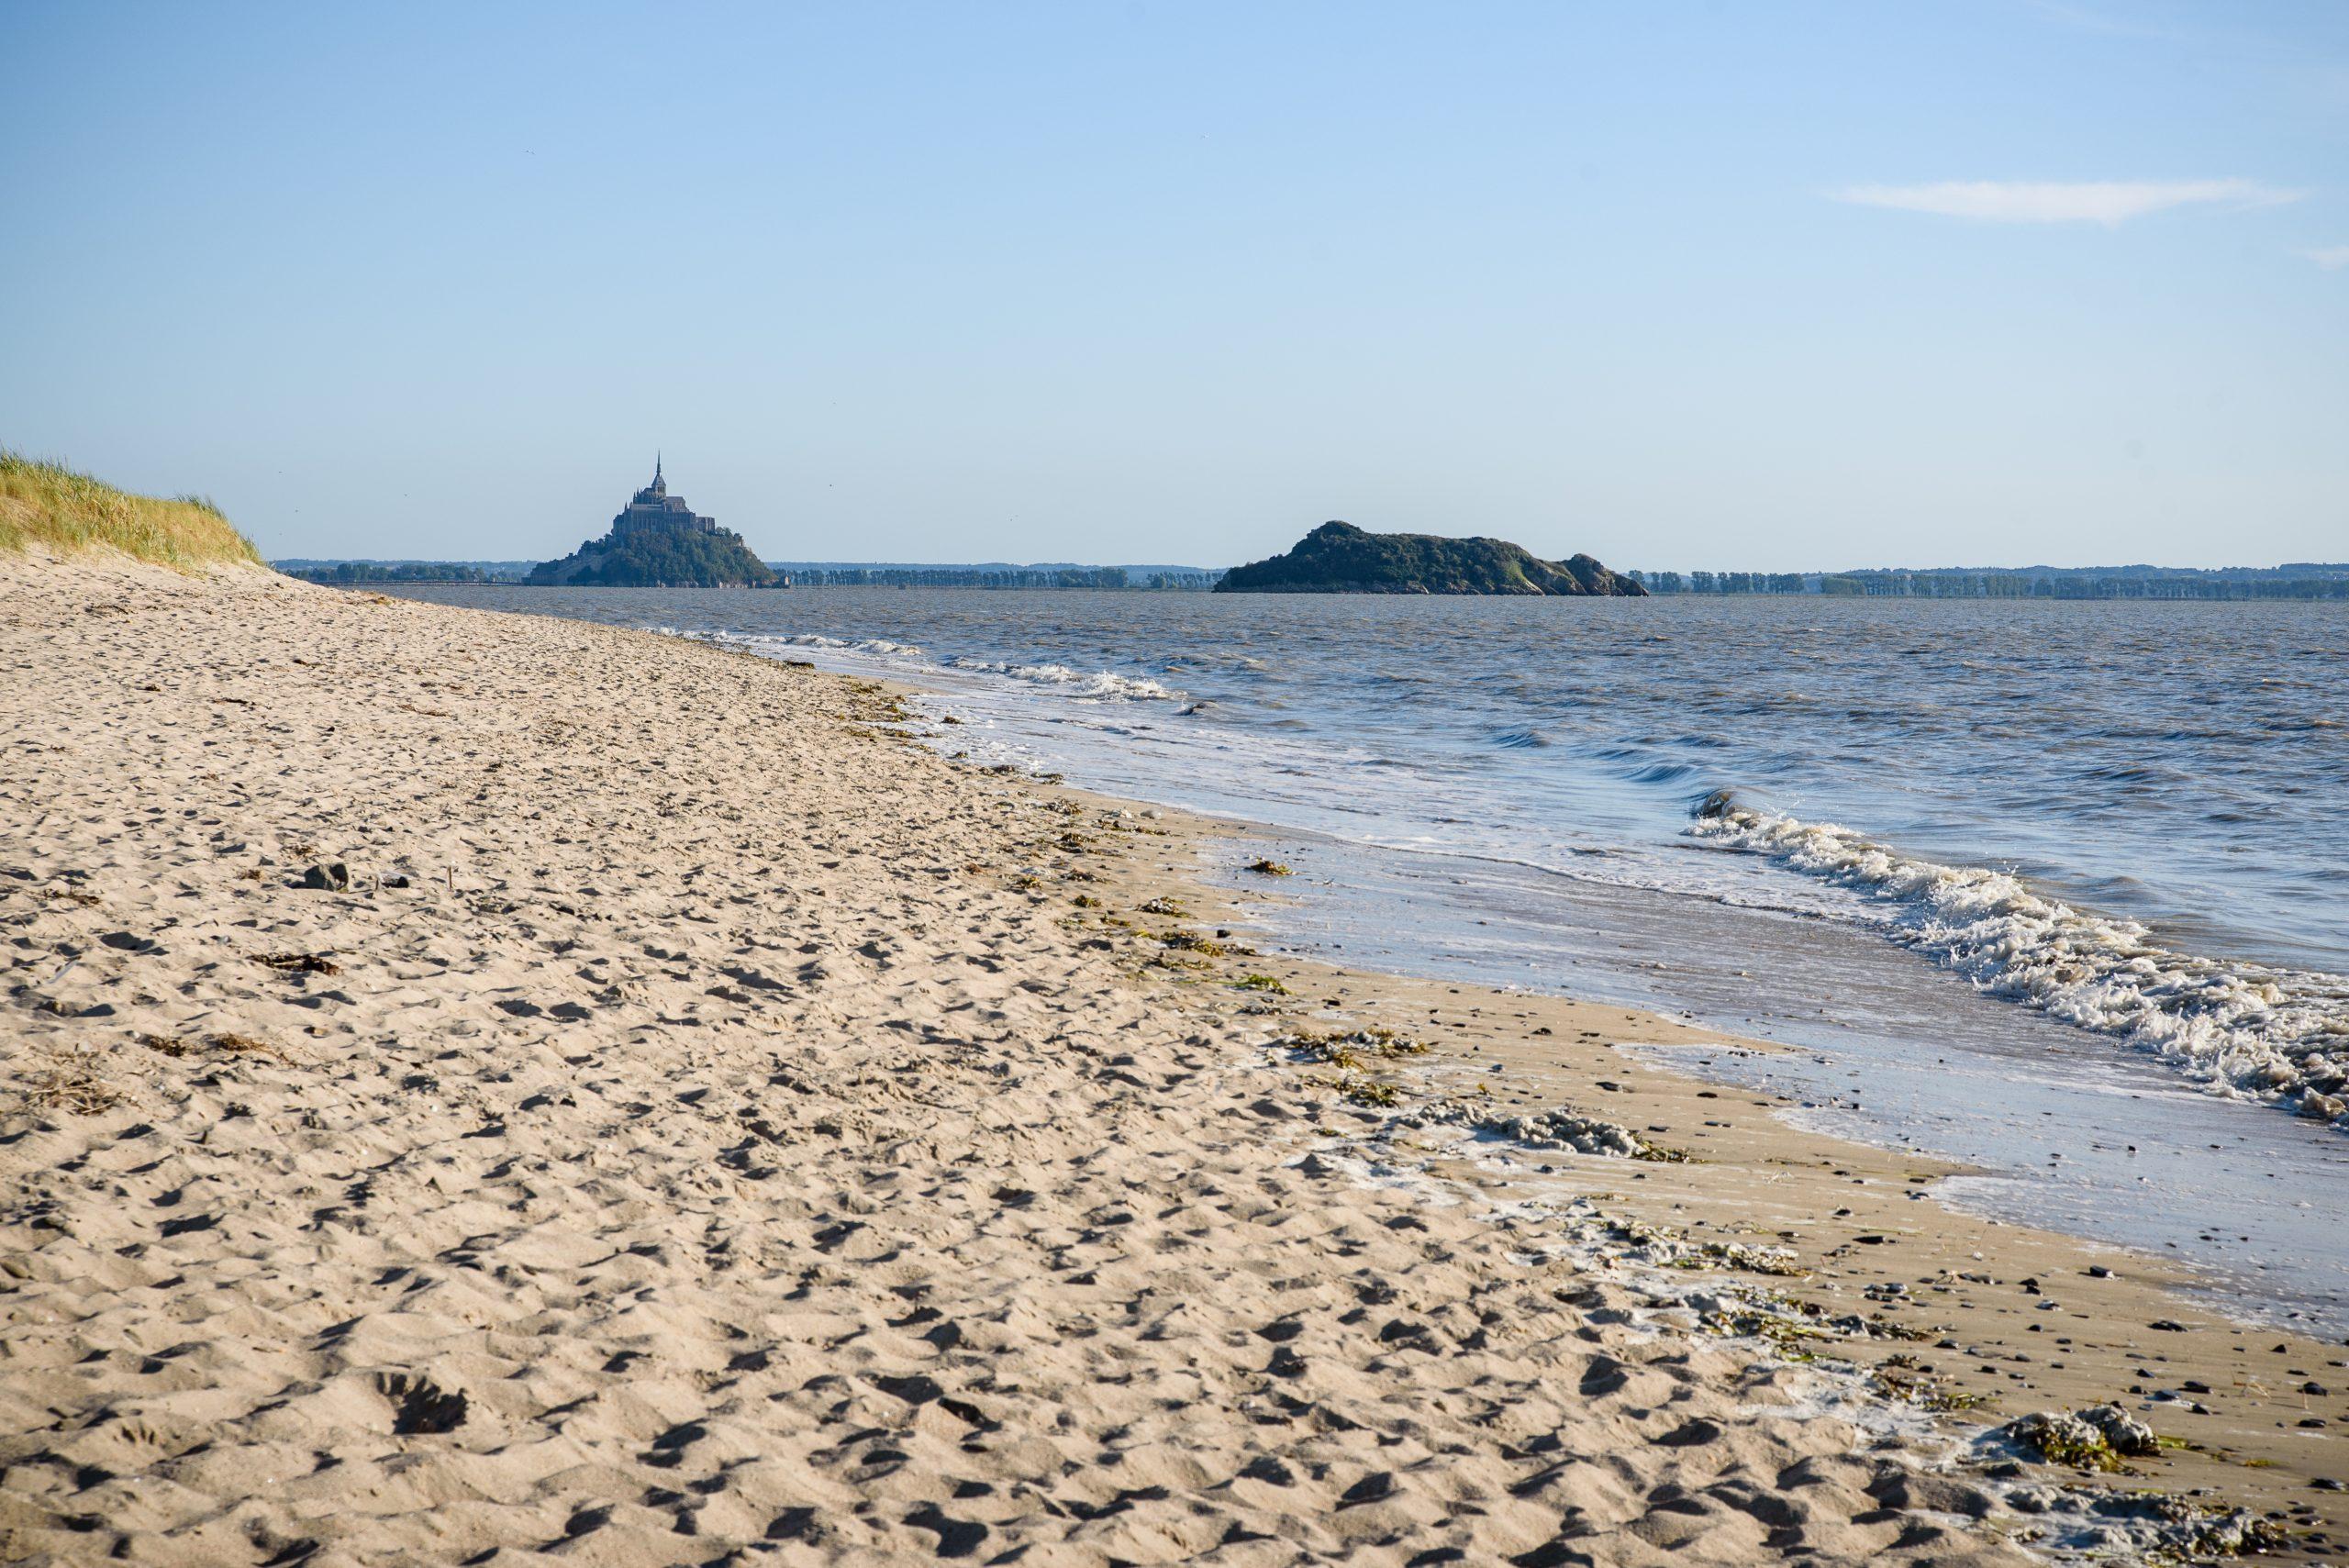 Mont Saint Michel widoczna z zatoki - Normandia